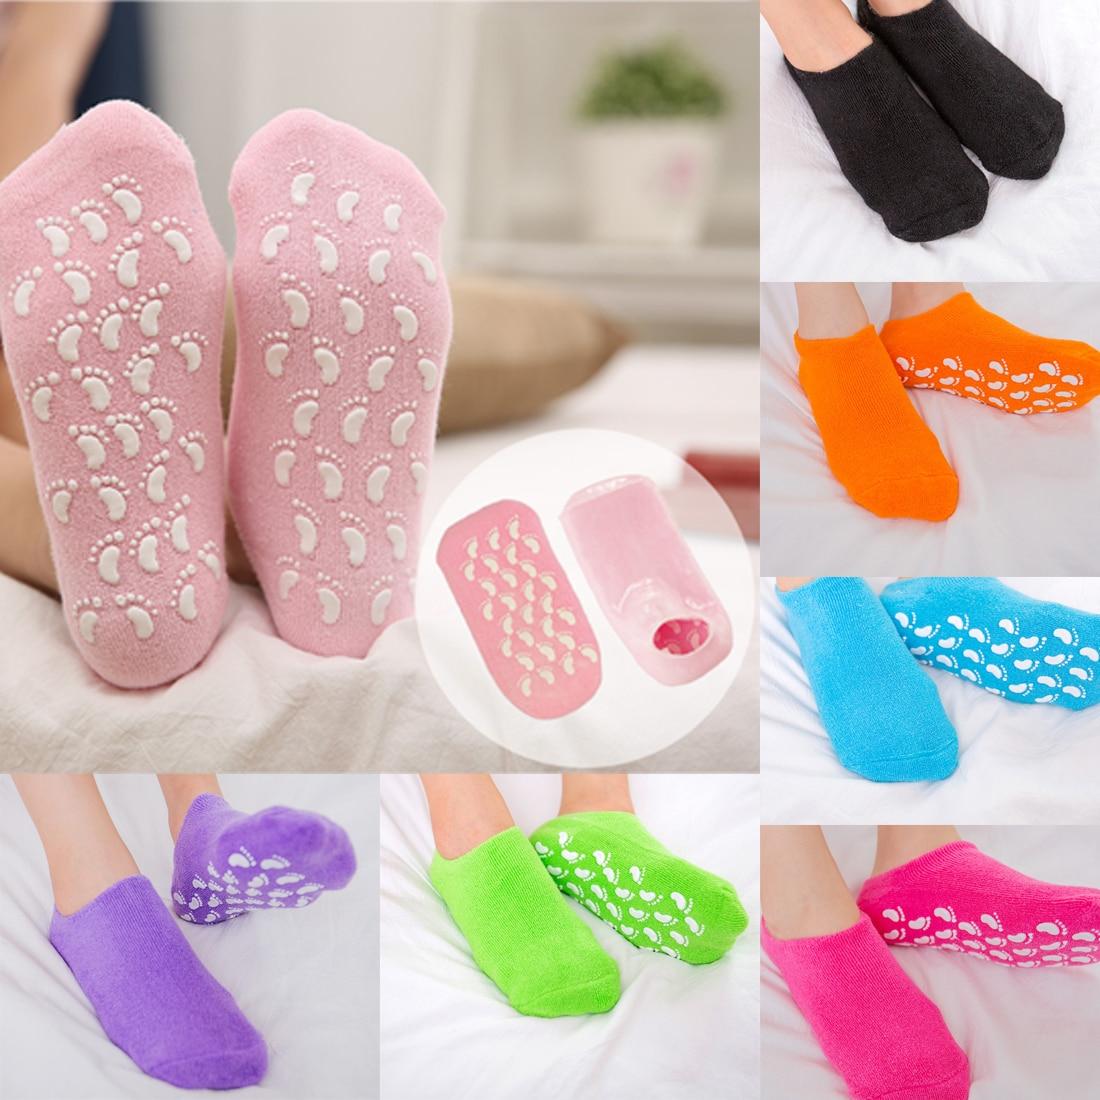 chaussettes hydratation pieds